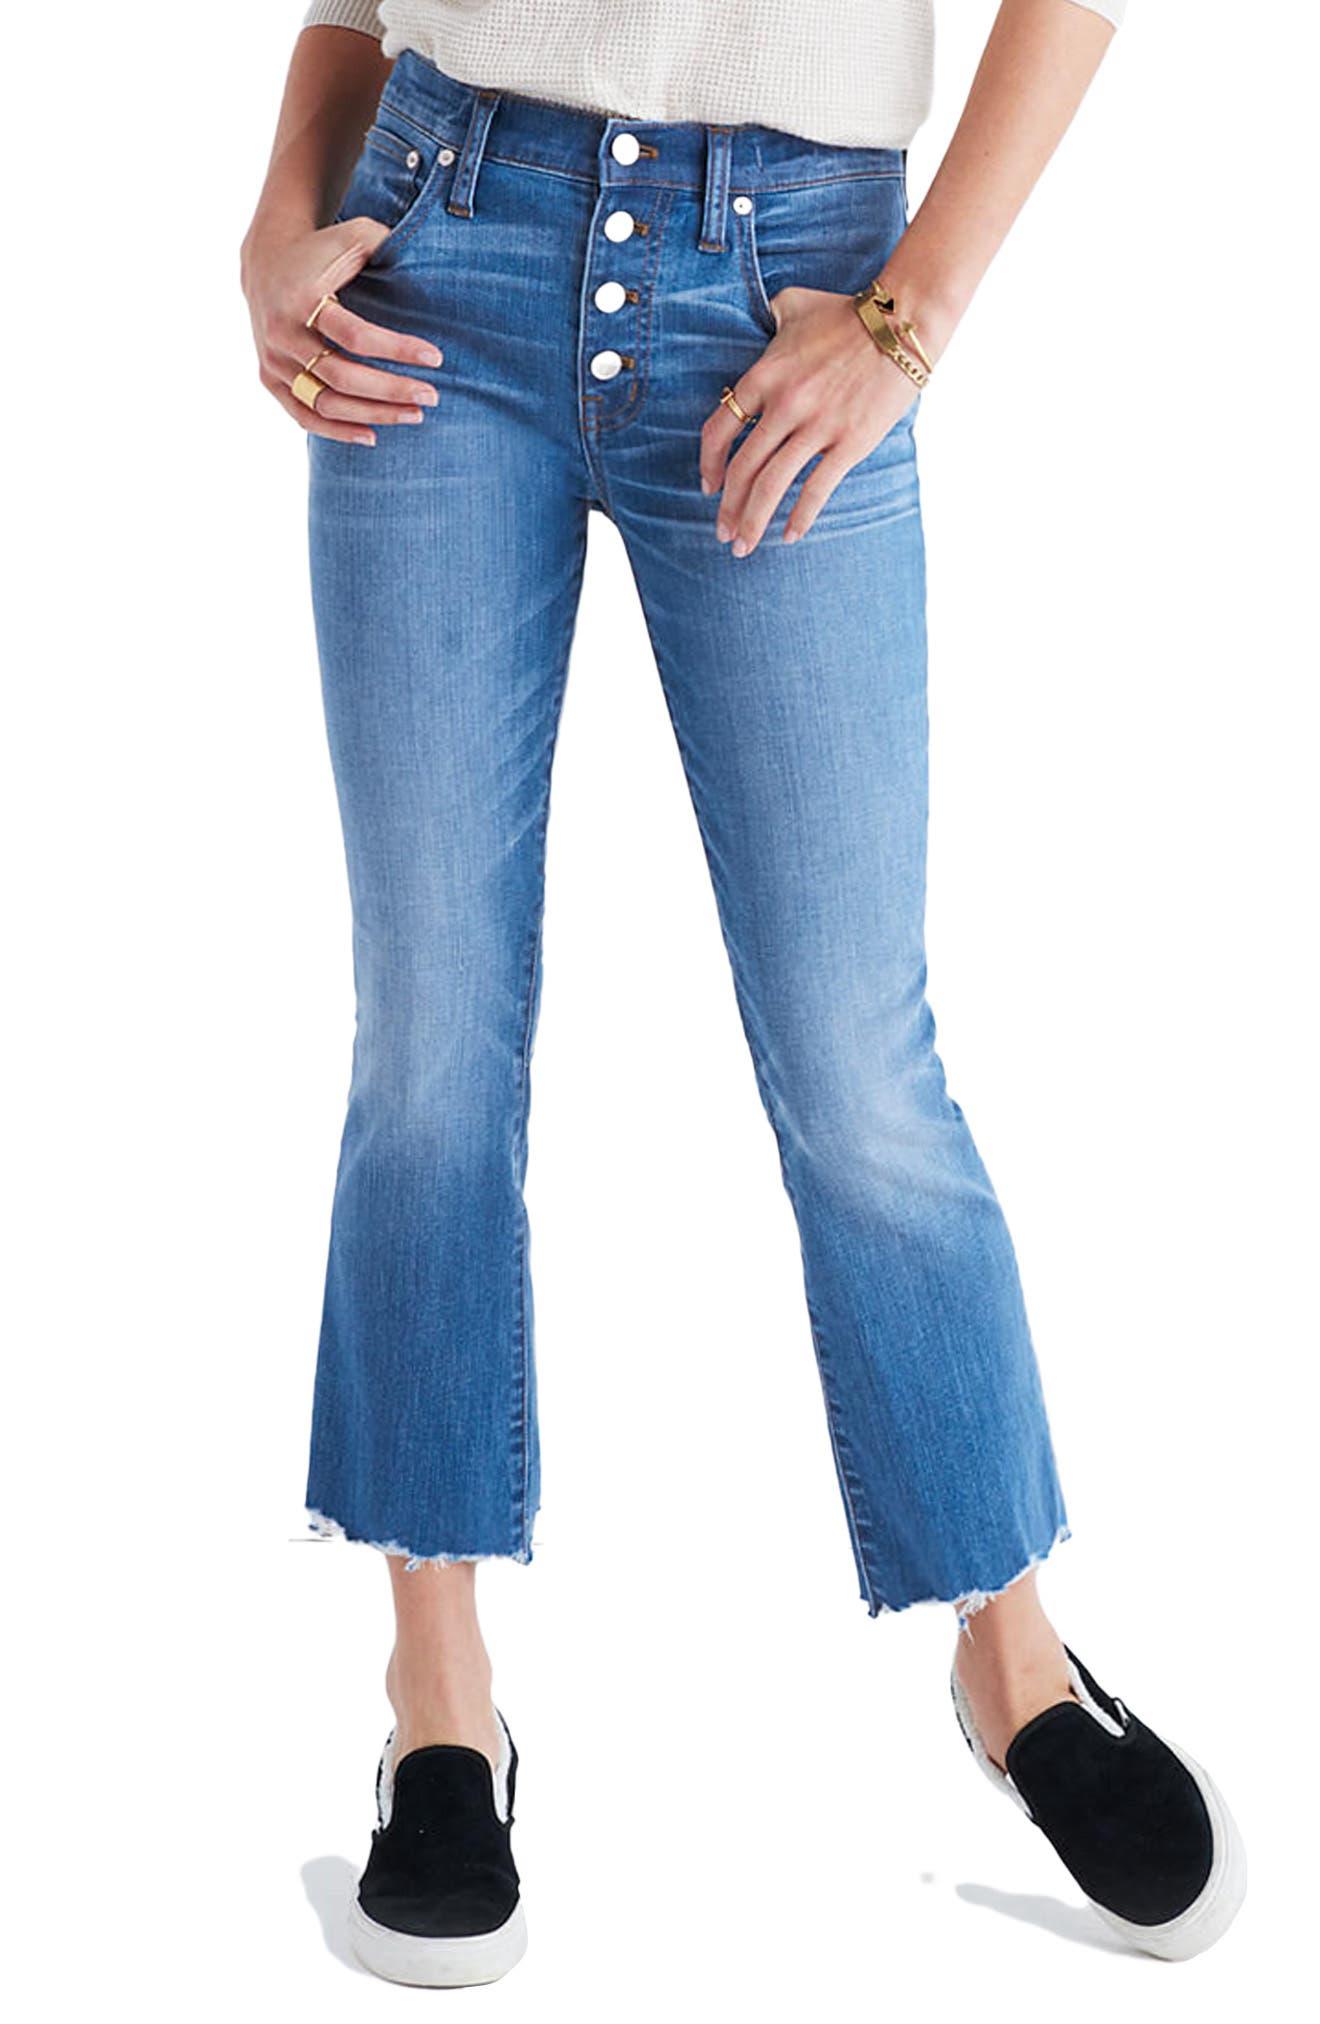 Main Image - Madewell Cali Demi Boot Jeans (Fenton Wash)